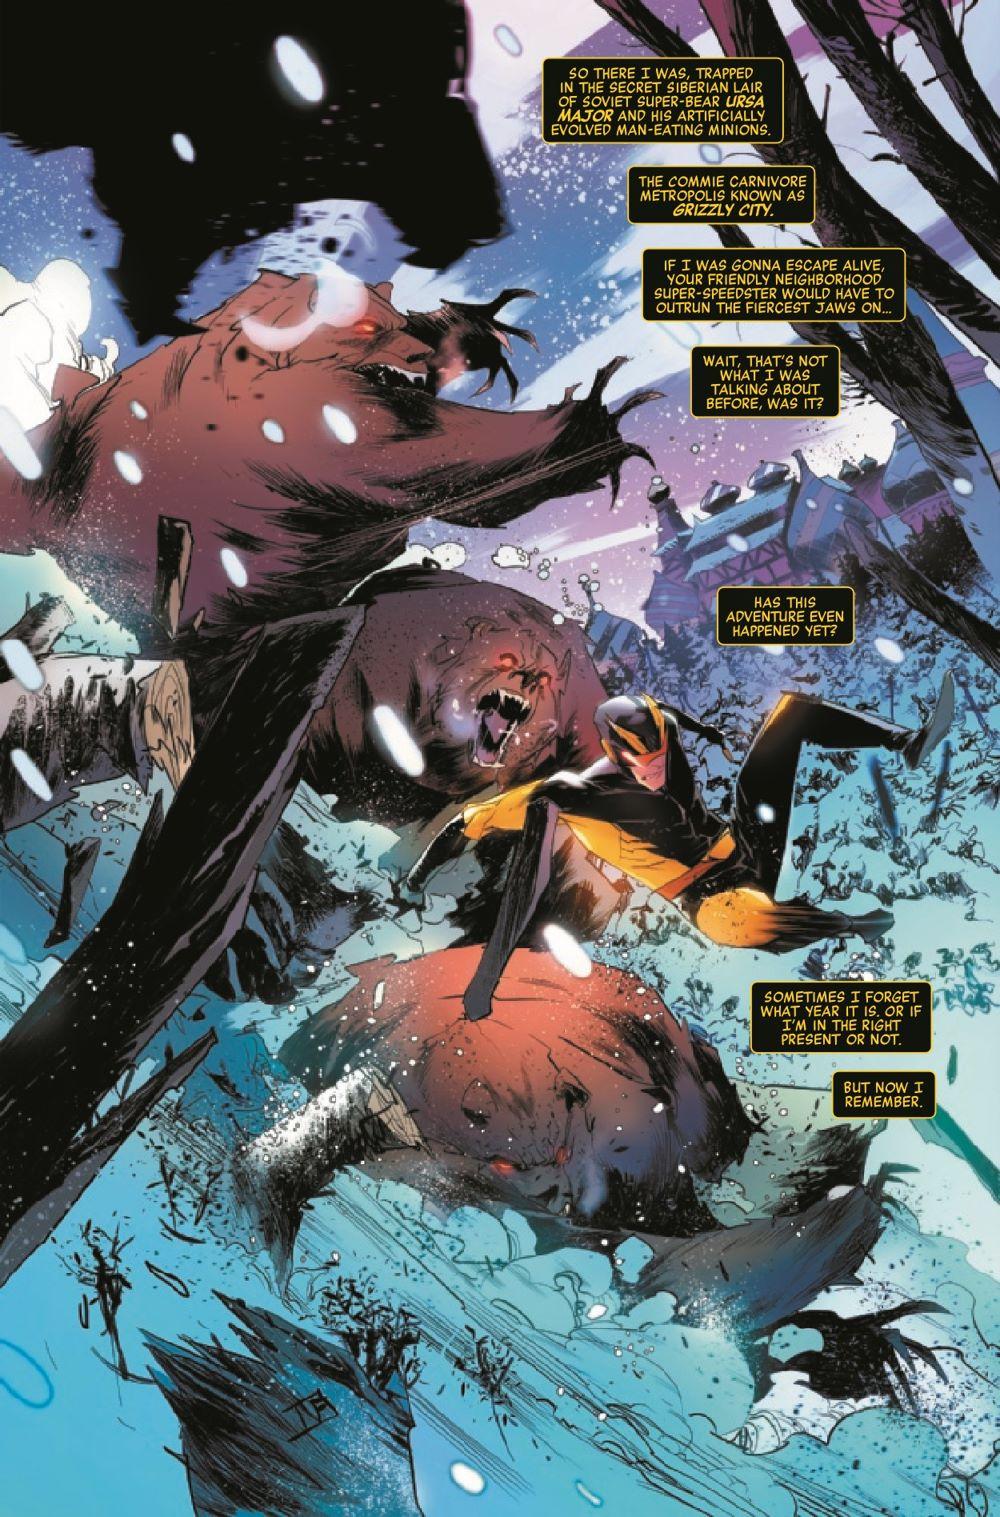 HEROESREBORN2021003_Preview-3 ComicList Previews: HEROES REBORN #3 (OF 7)